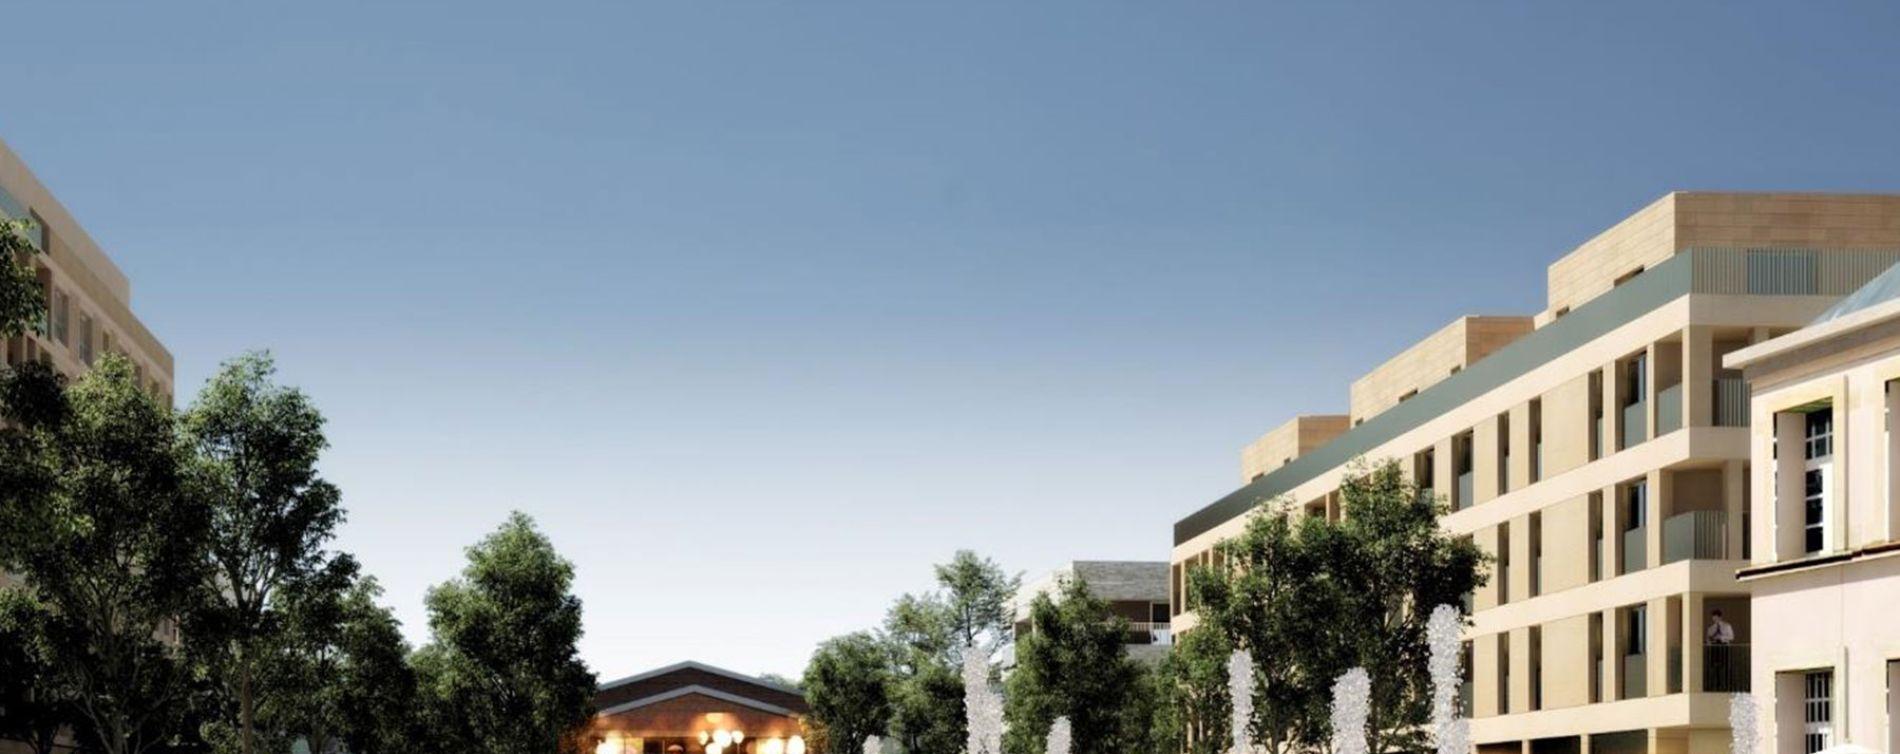 Montigny-lès-Metz : programme immobilier neuve « IdéalIz » en Loi Pinel